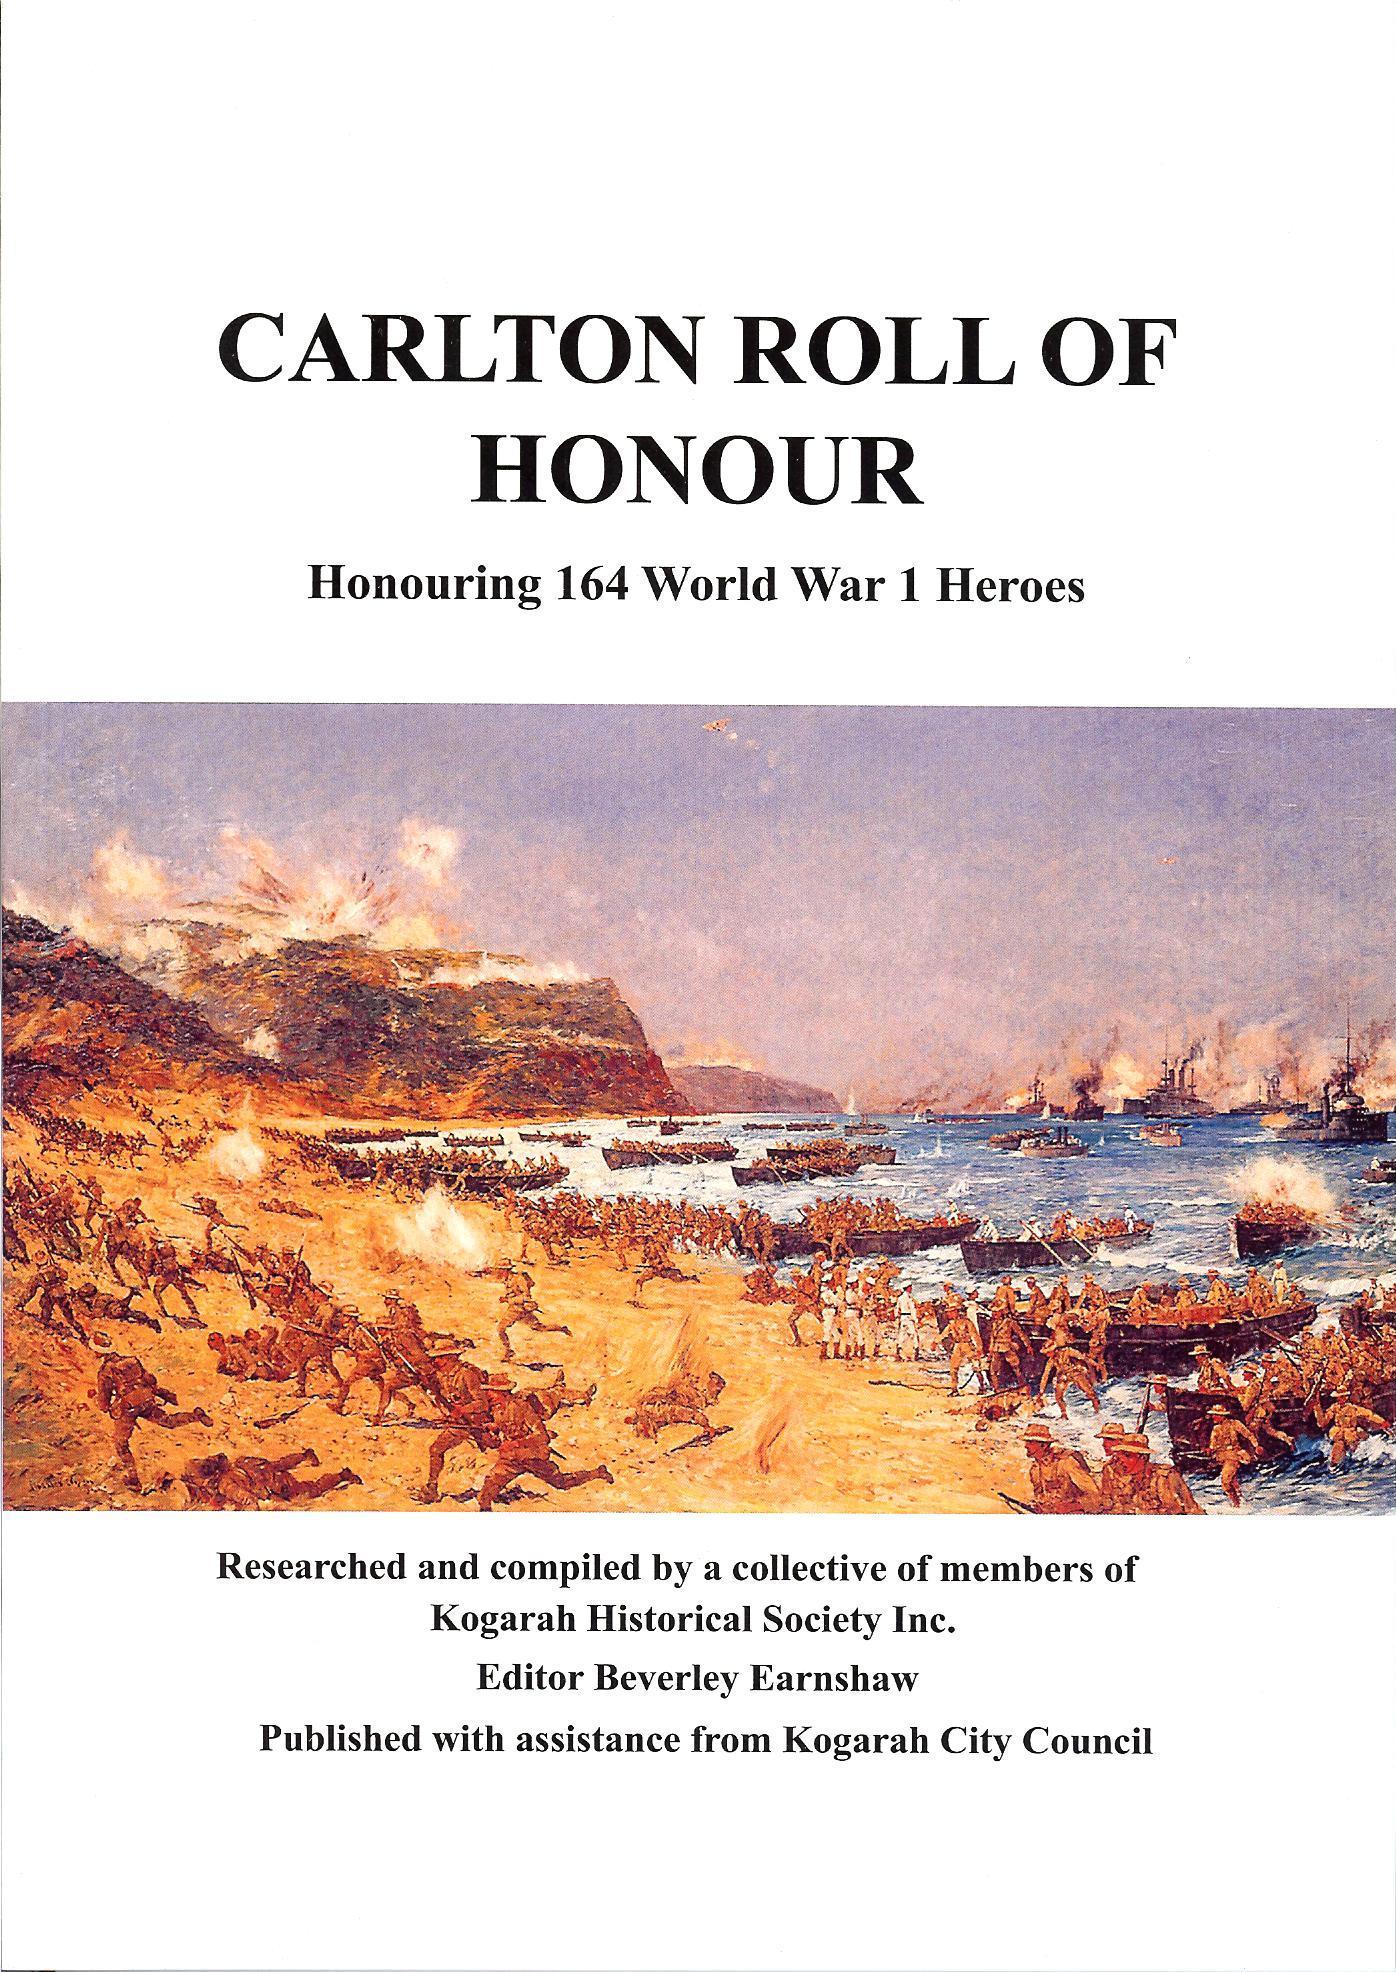 Carlton Roll of Honour